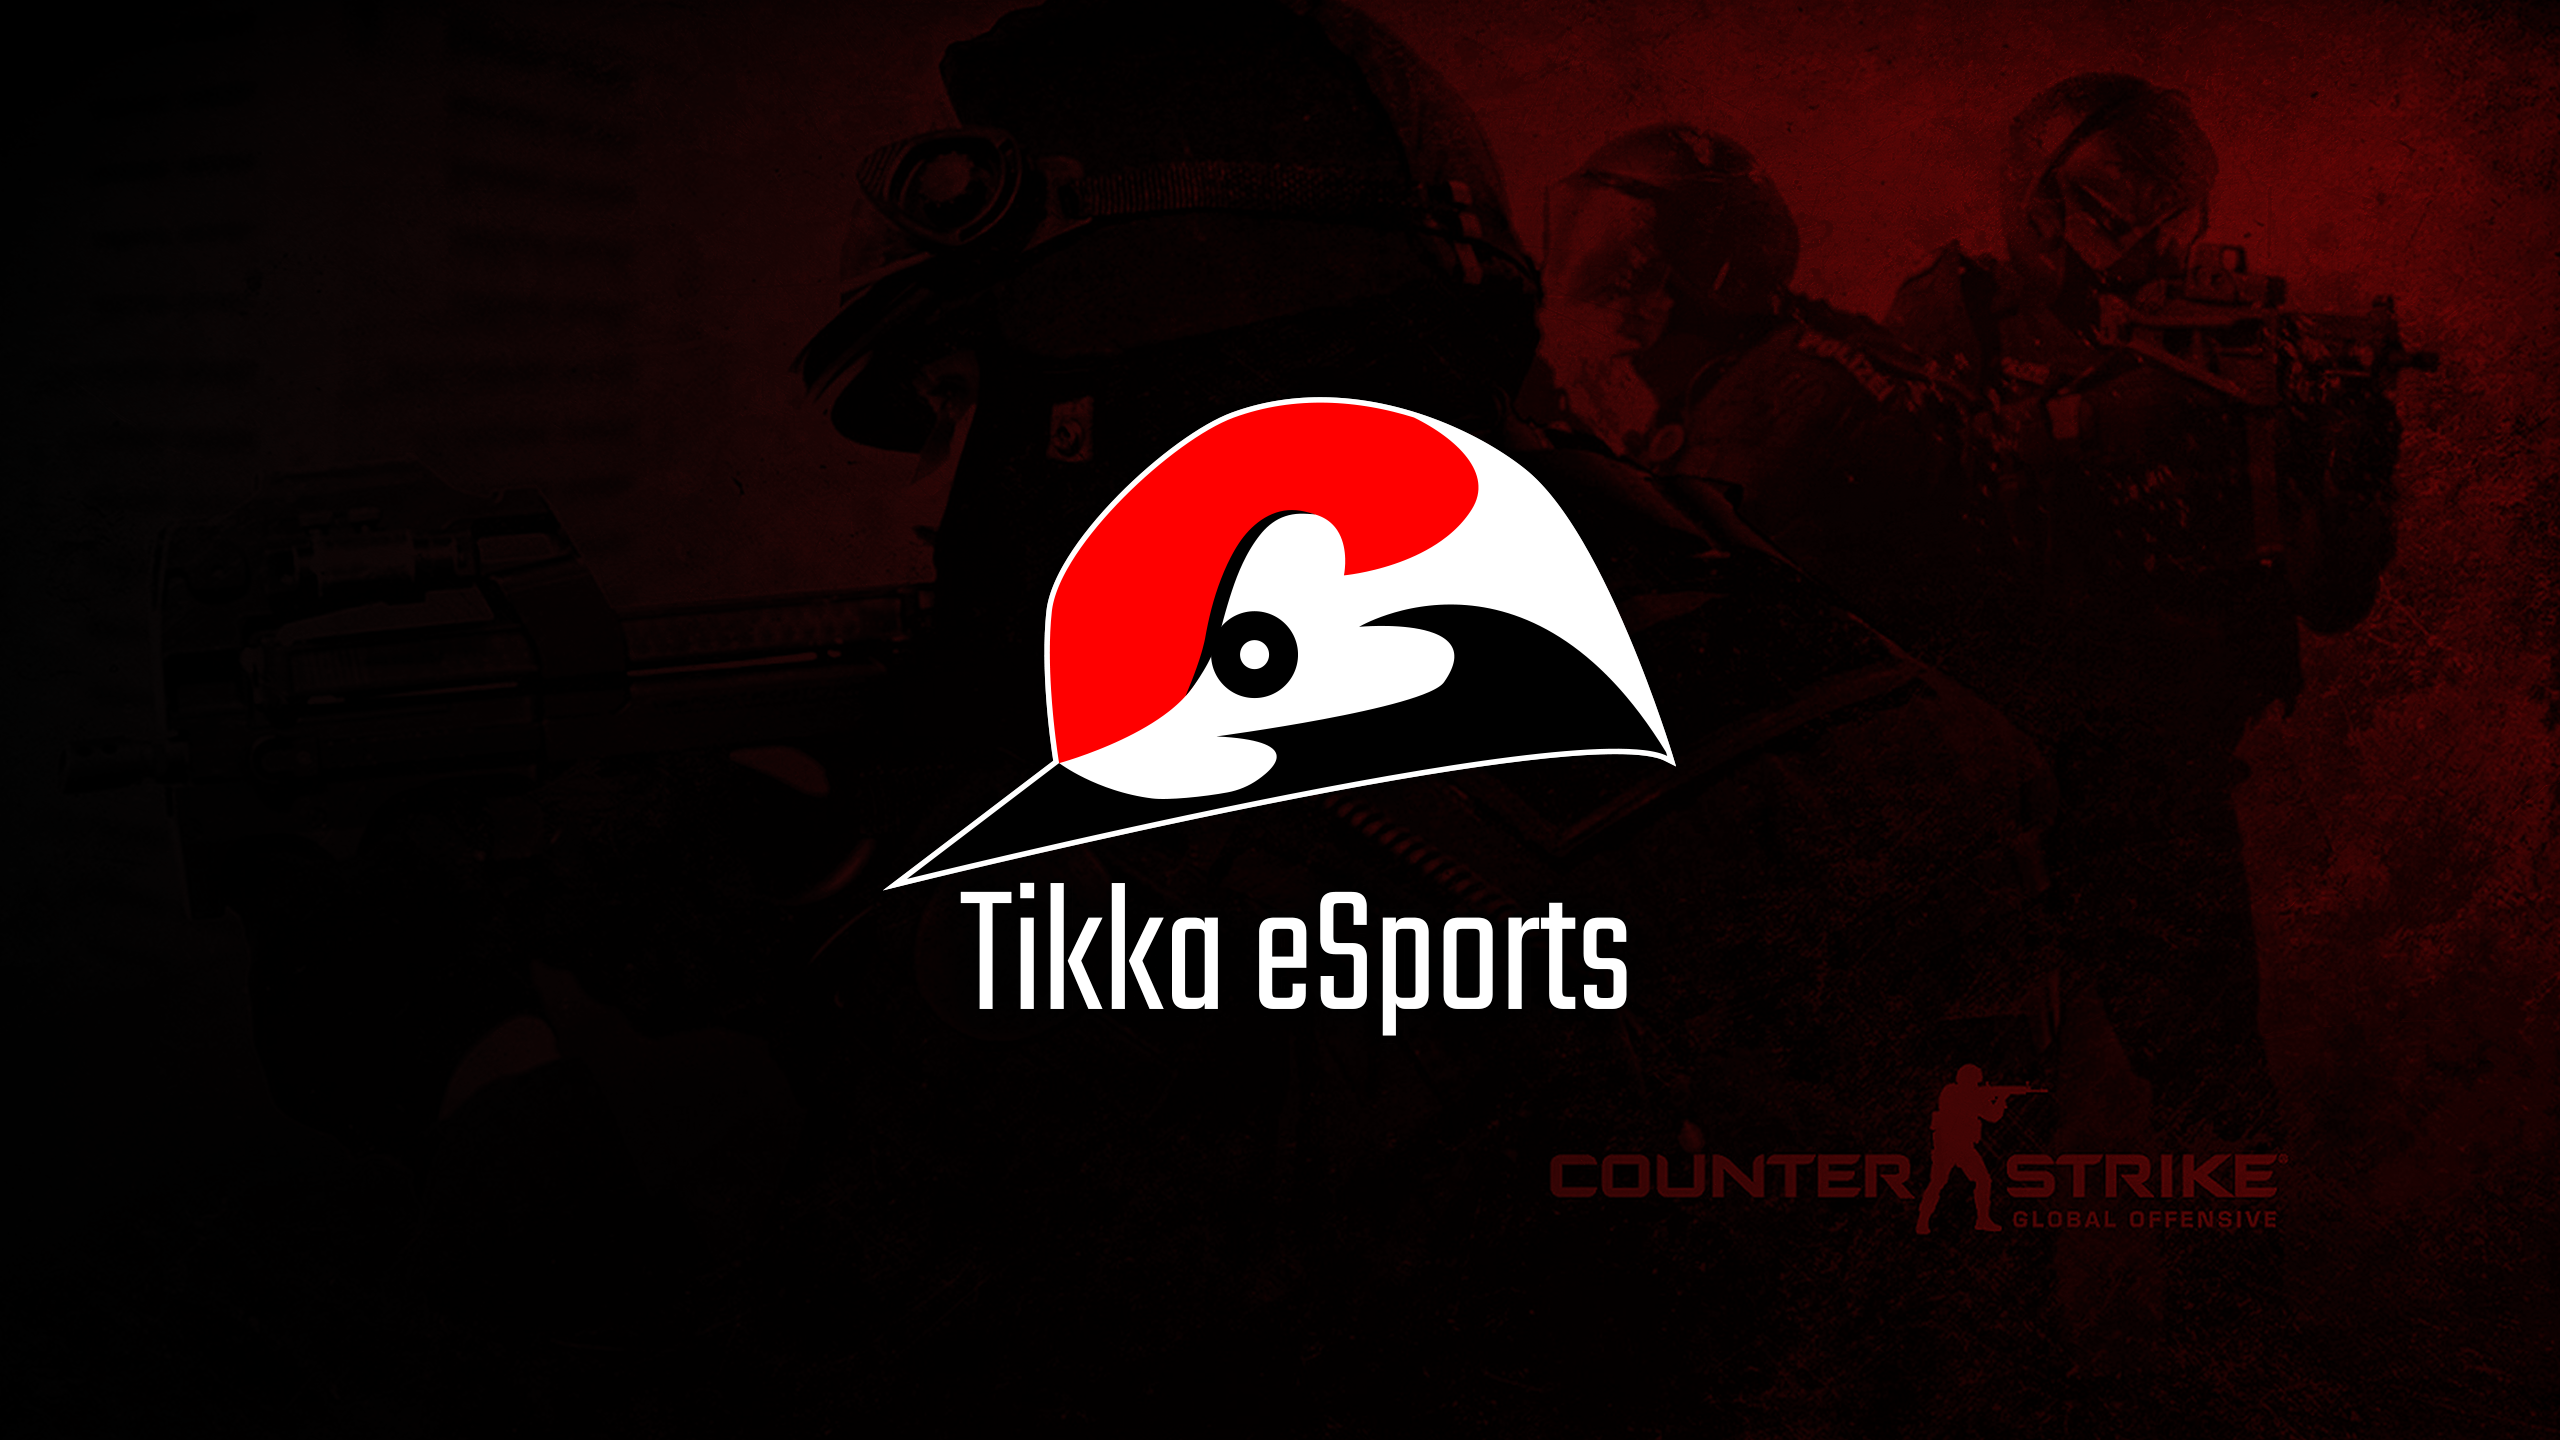 Tikka Esports